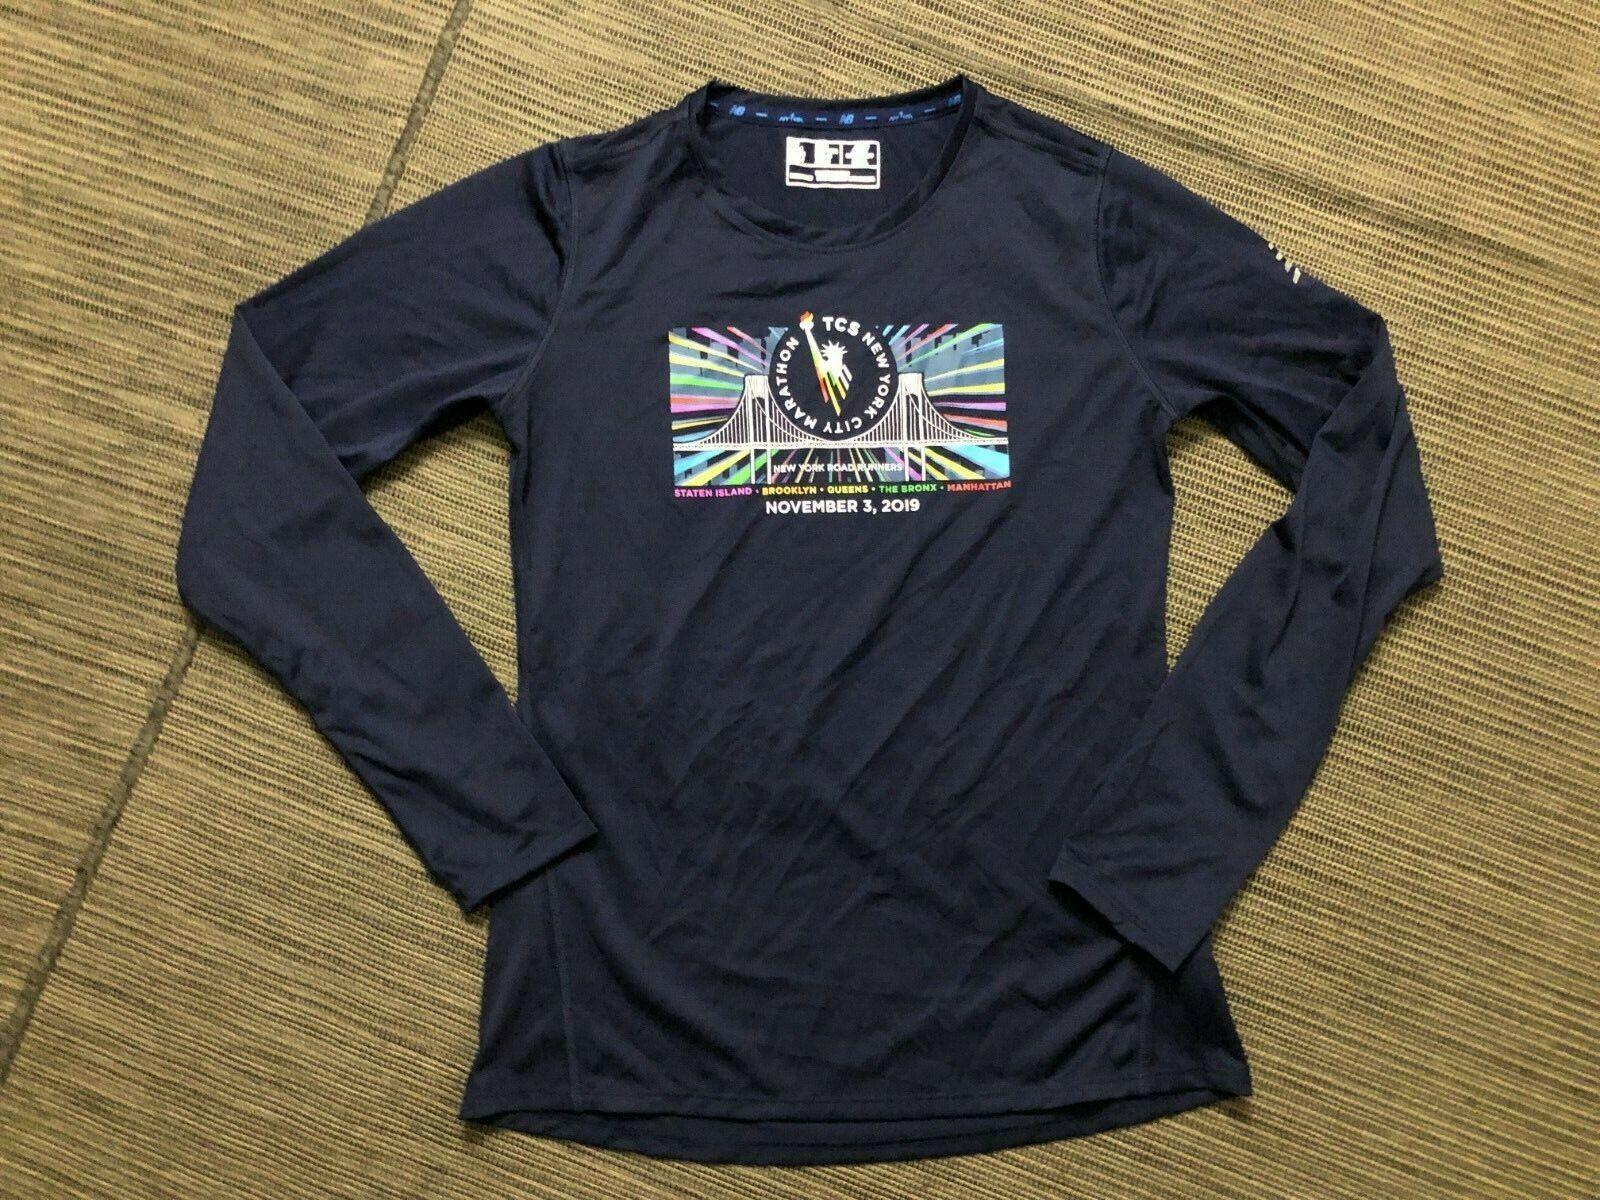 New Balance Womens Small TCS NYC Marathon 2019 Long Sleeve Shirt Top